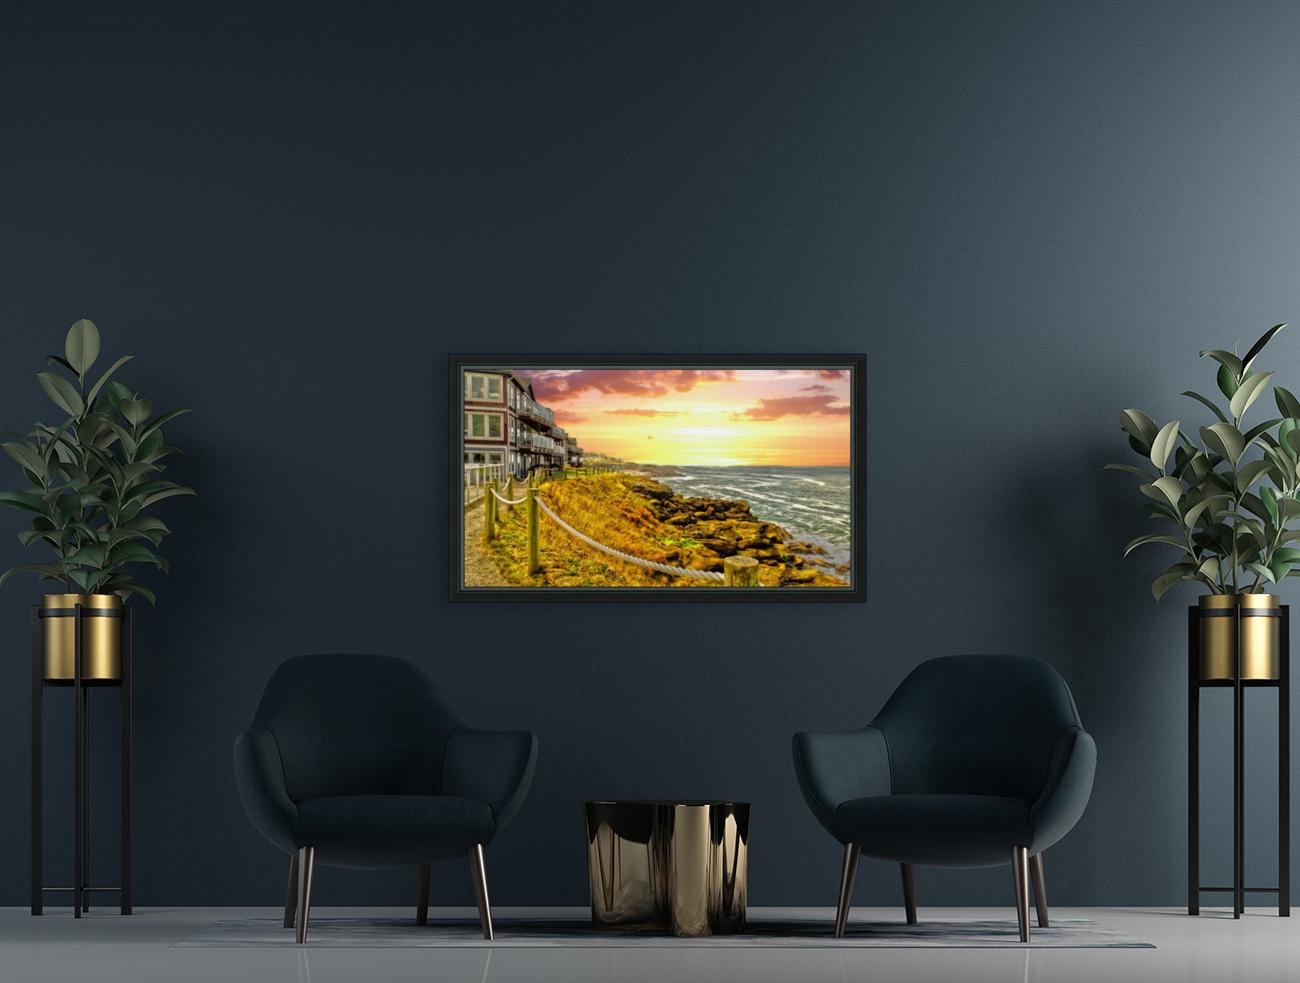 Depoe Bay On the Oregon Coast - Art Style  Art